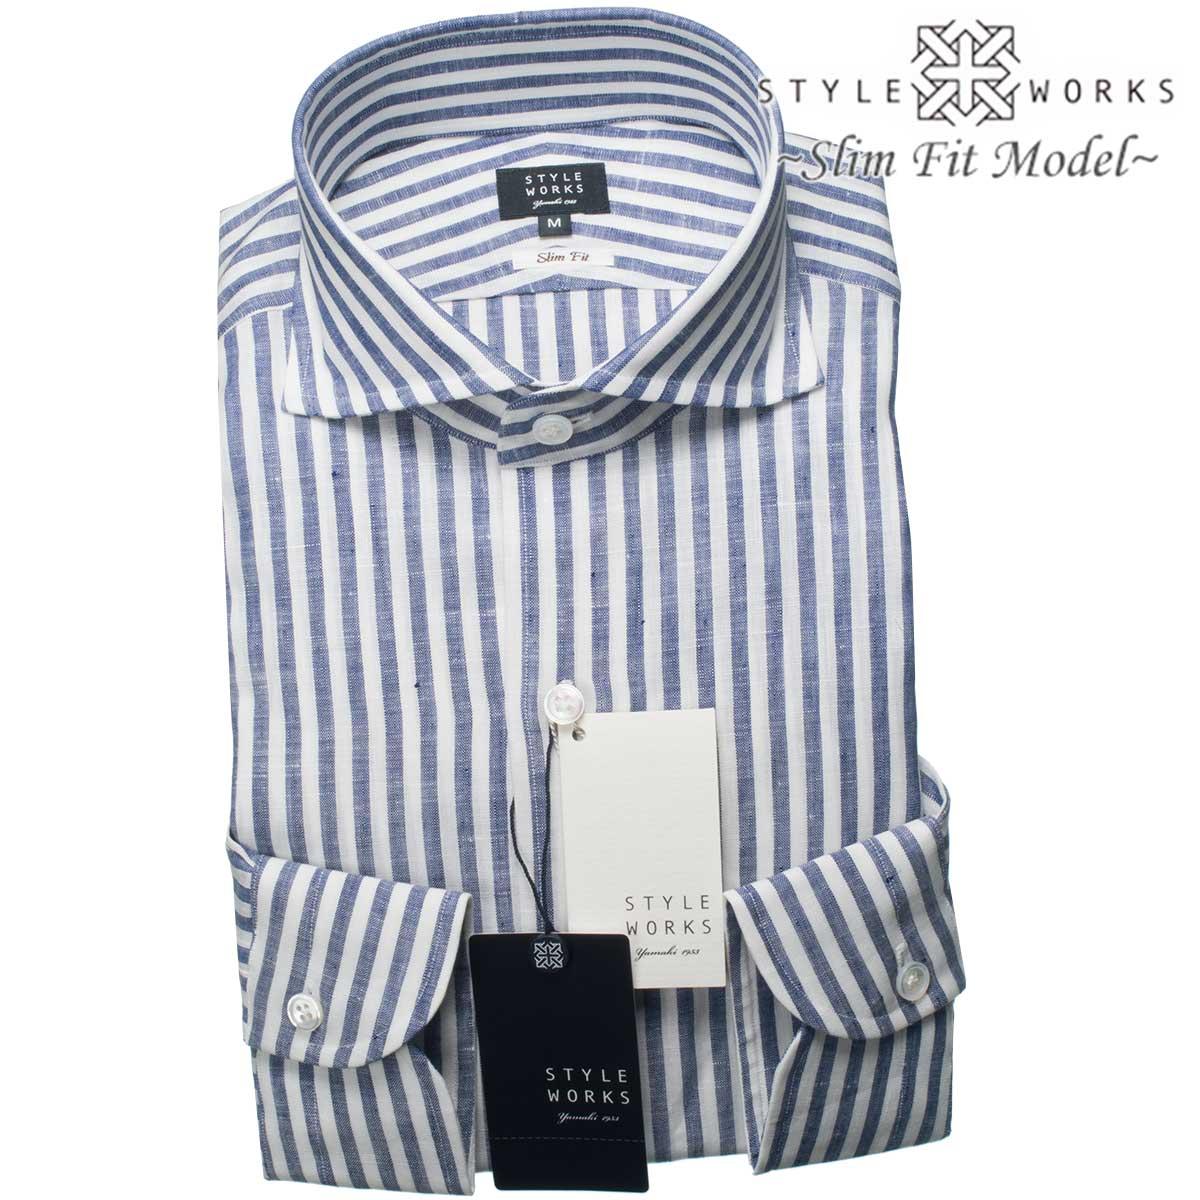 6a70c55165 STYLE WORKS: Domestic long sleeves dress shirt Vintage Line slim fitting  cutaway wide linen cotton blue London stripe men fs3gm | Rakuten Global  Market